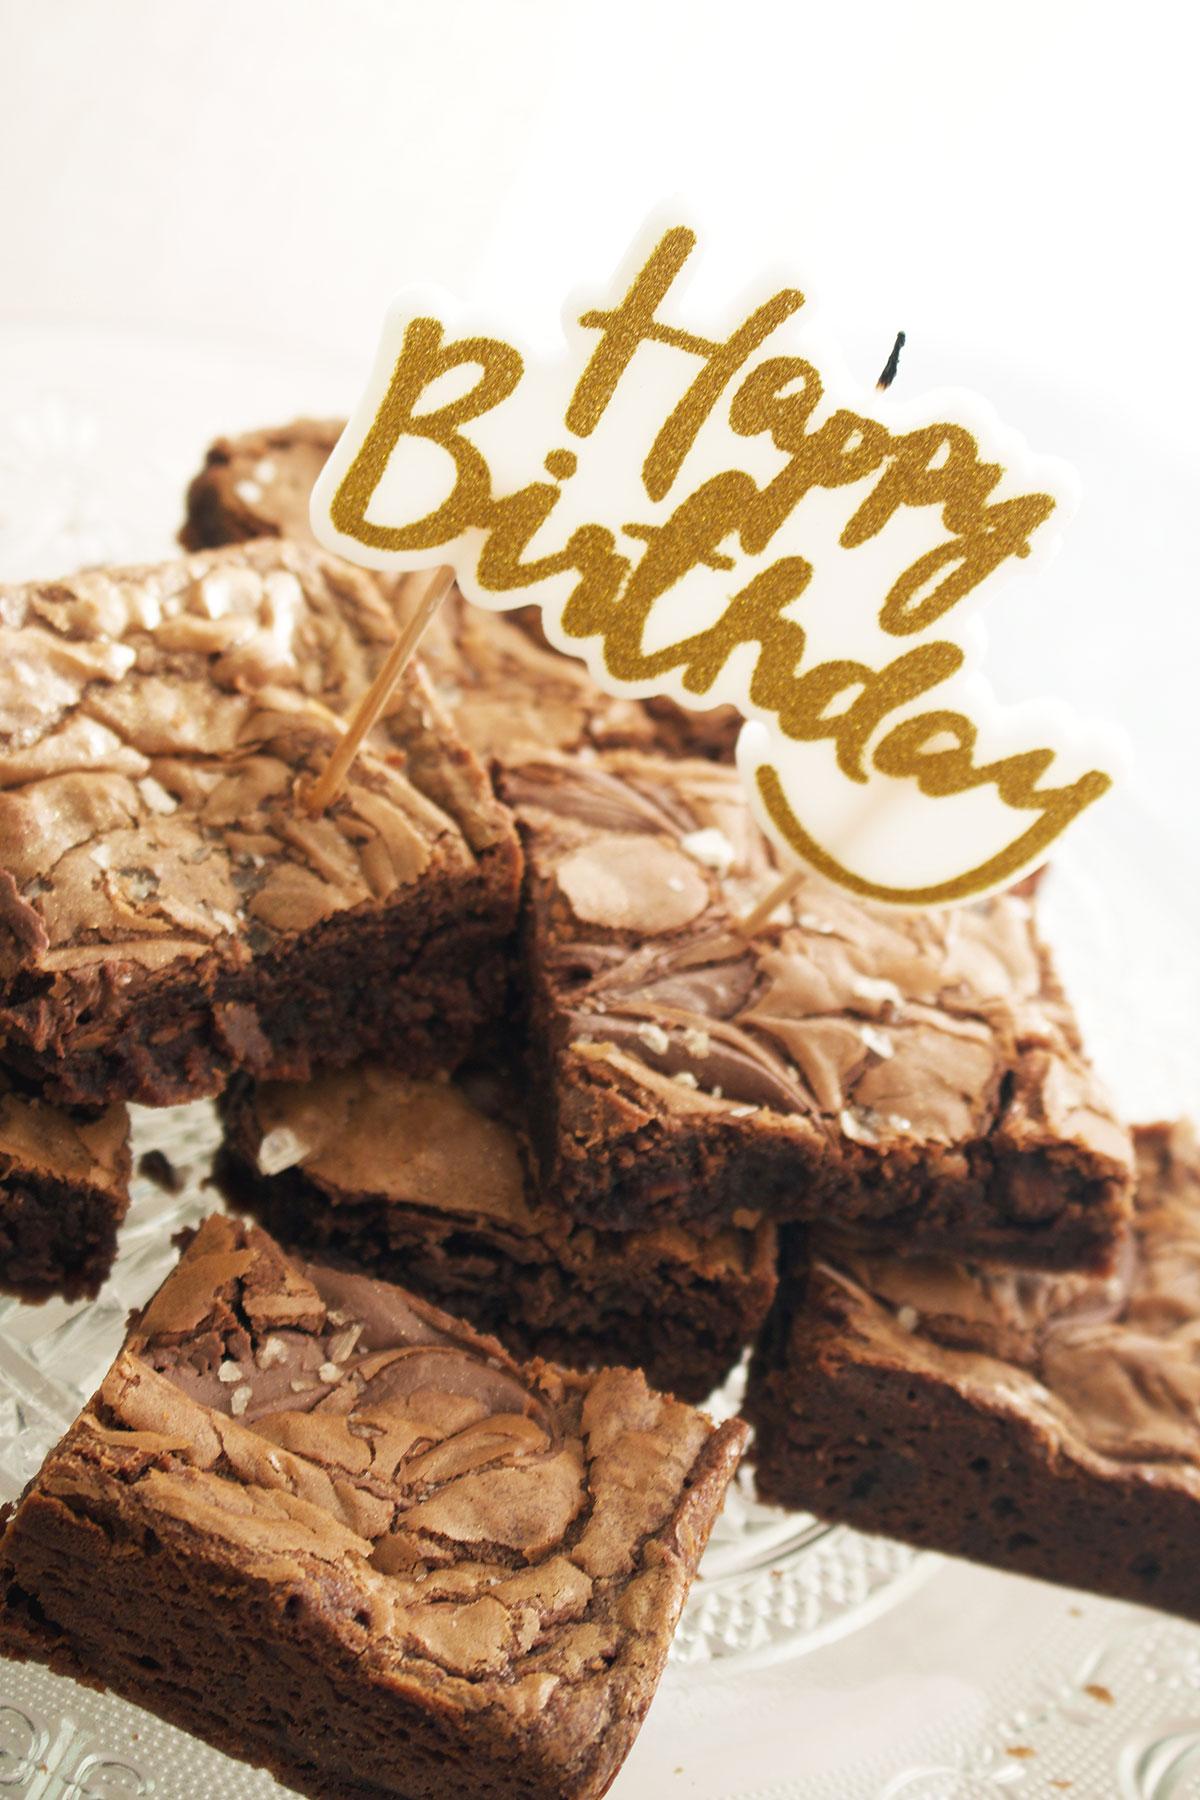 Enjoyable Smoked Salt And Nutella Birthday Brownies Funny Birthday Cards Online Elaedamsfinfo